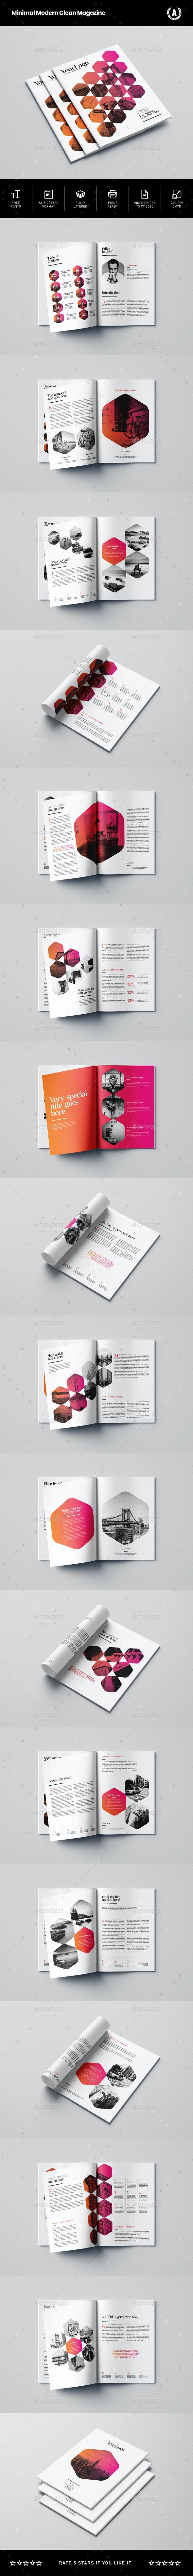 Minimal Modern Clean Magazine - Magazines Print Templates